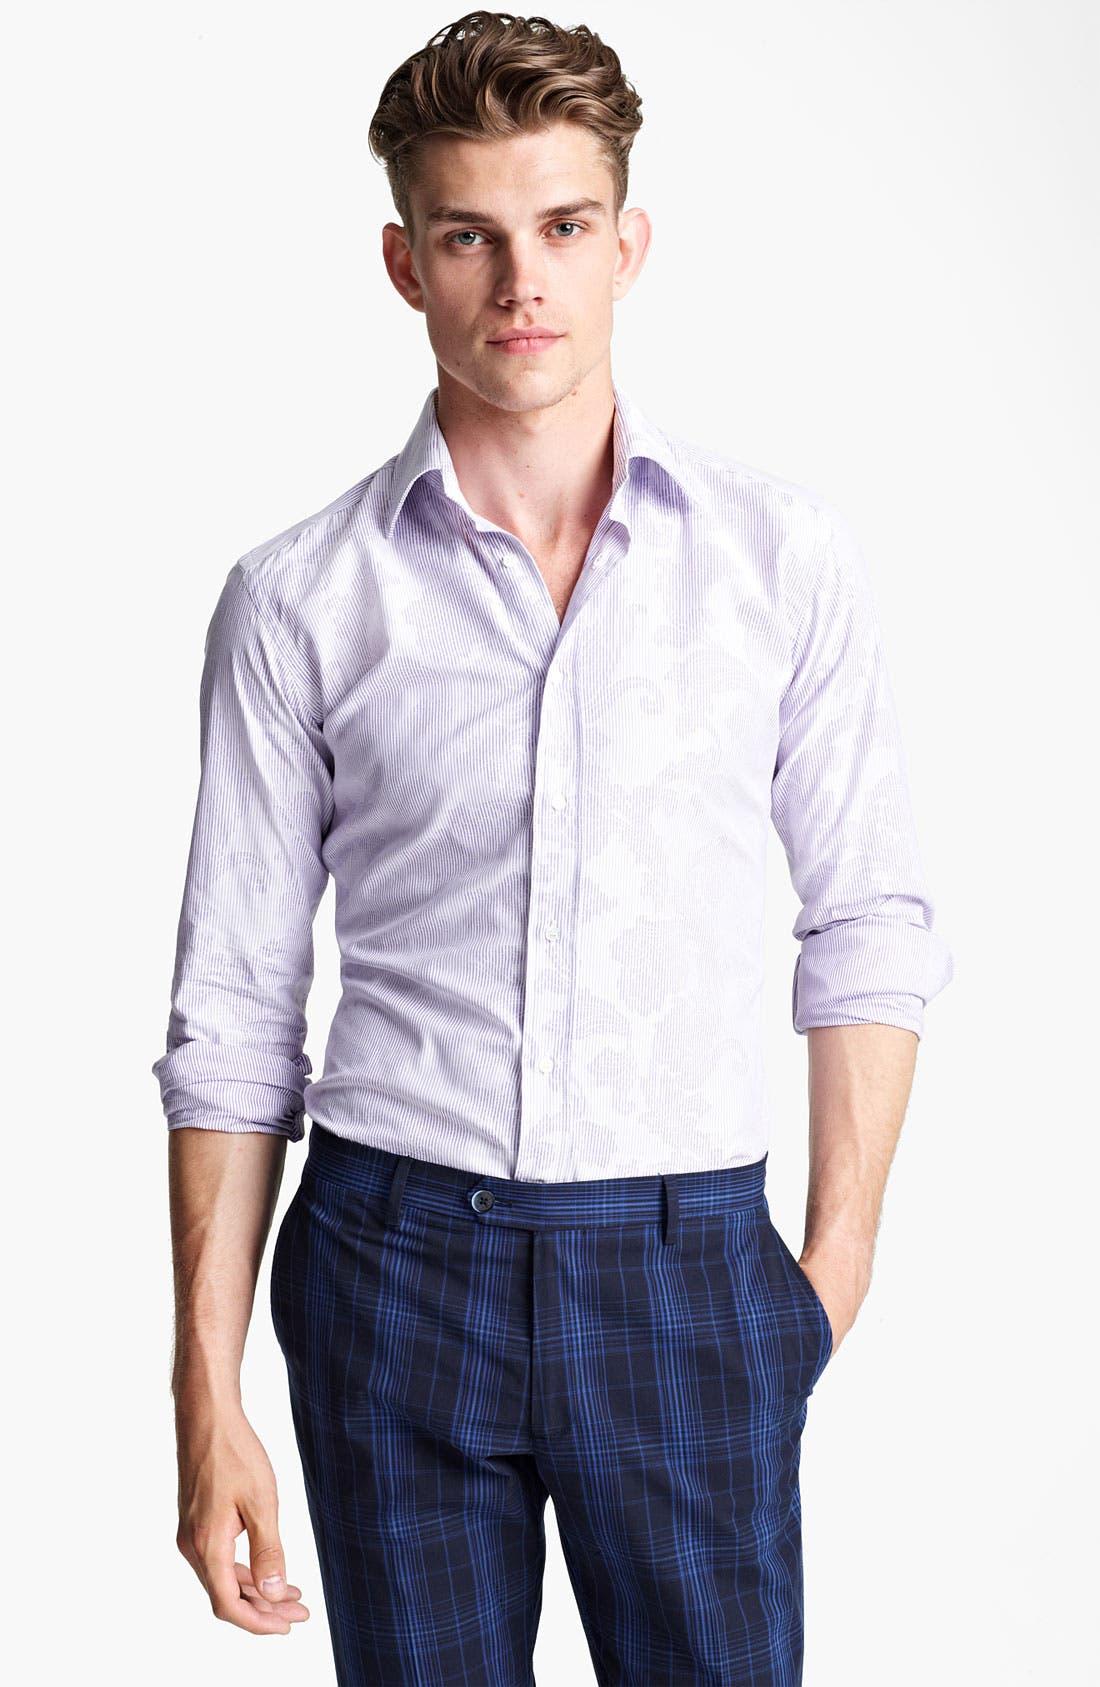 Alternate Image 1 Selected - Etro Pinstripe Jacquard Print Dress Shirt